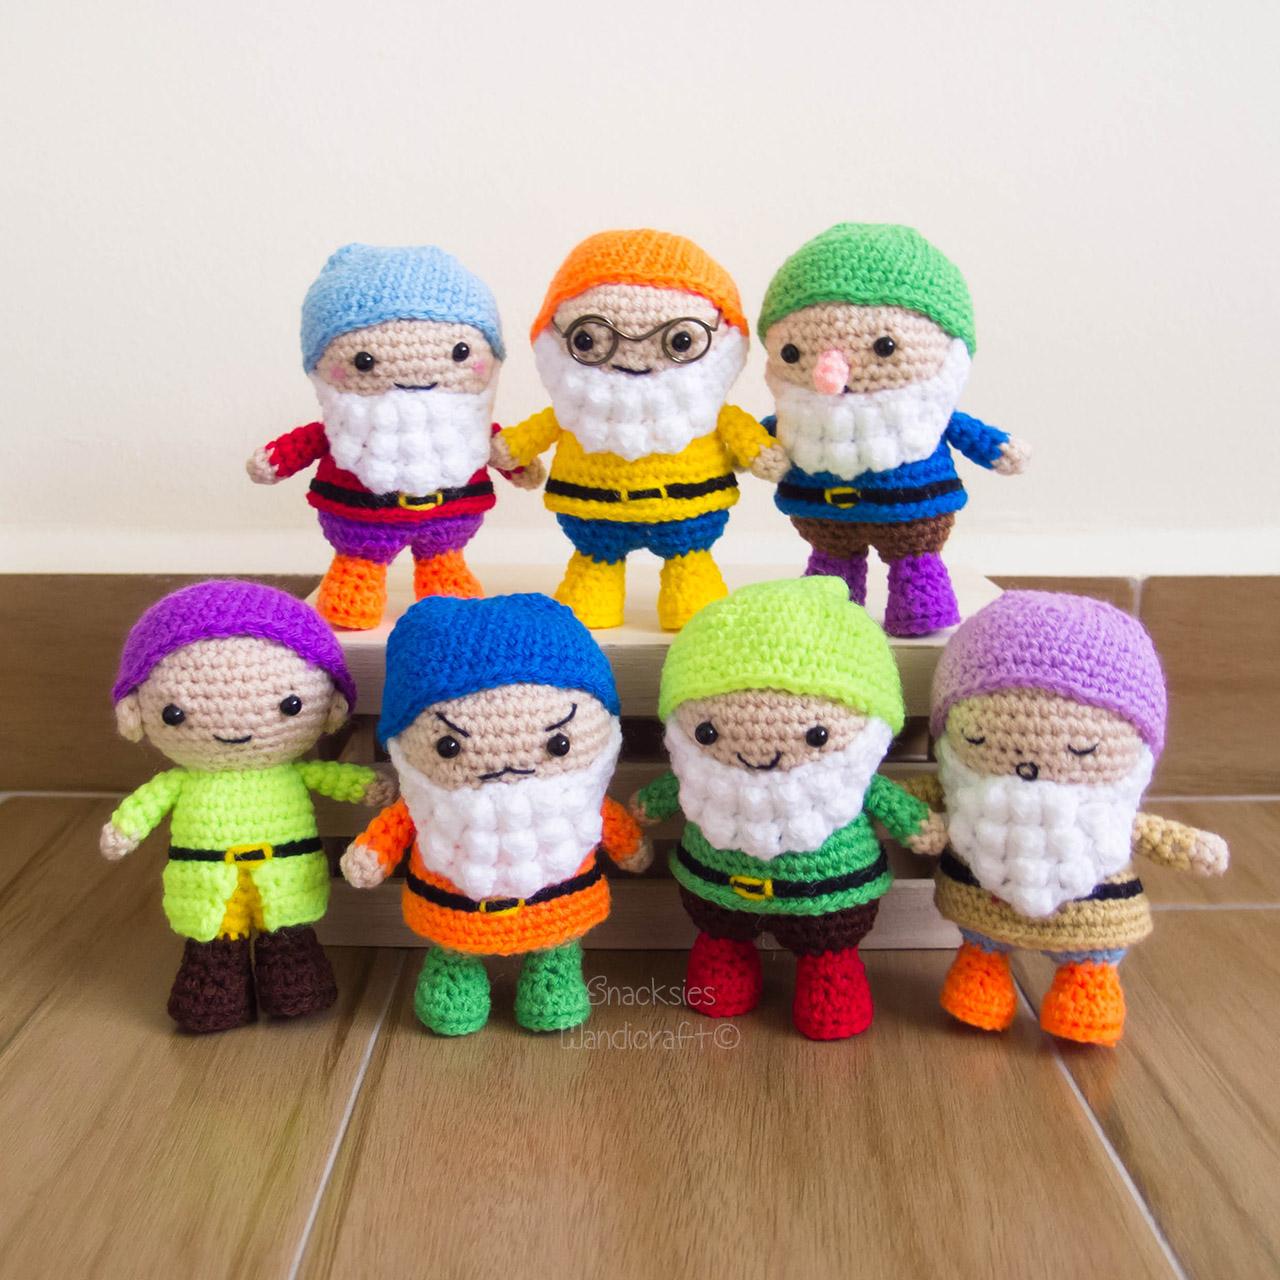 Exceptionnel Seven Dwarfs Crochet Amigurumi Pattern (free) ~ Snacksies  ZQ52